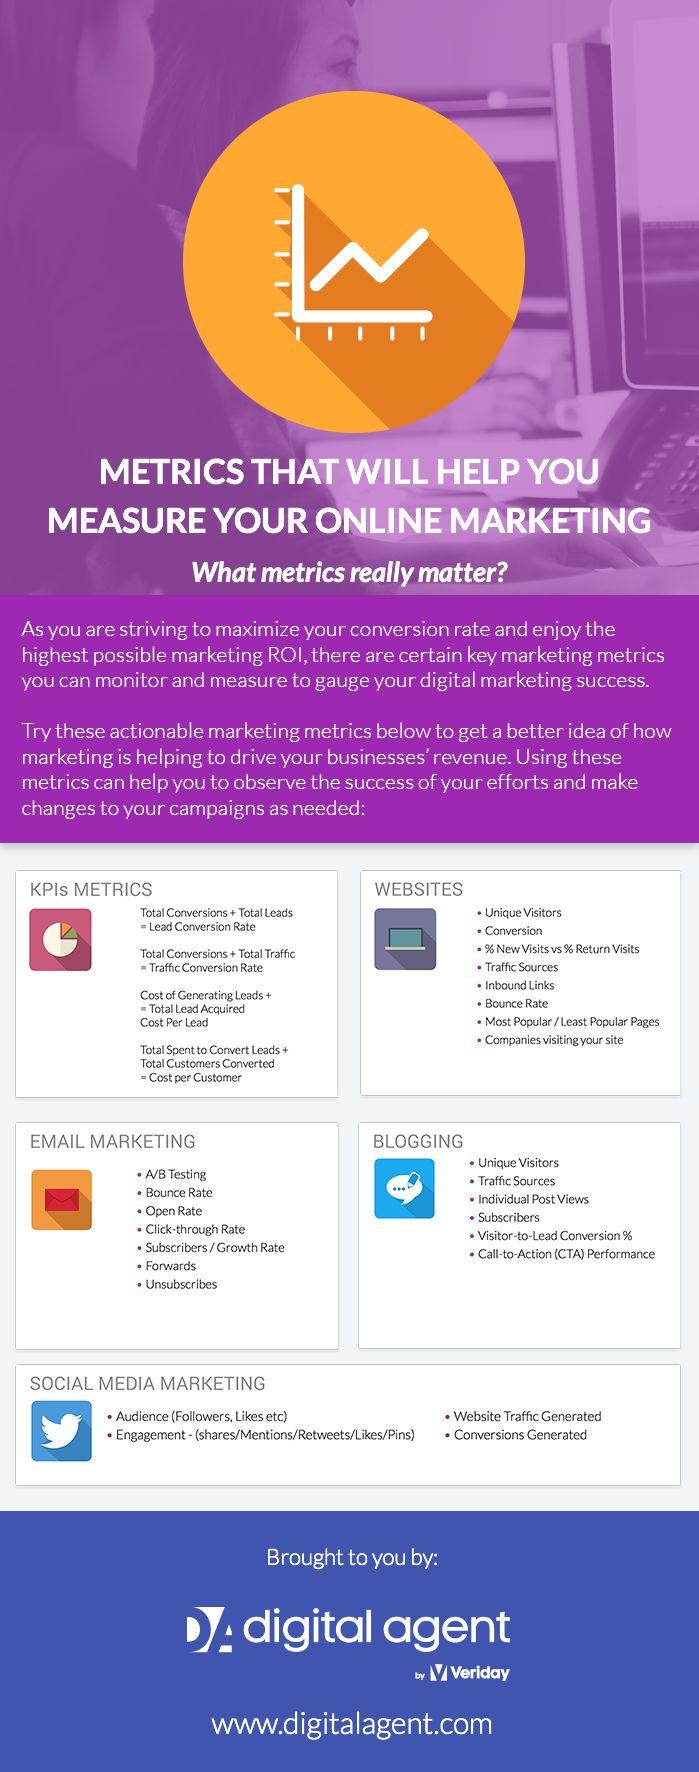 Metrics to Measure Advisor's Online Marketing Success:  What metrics really matter?